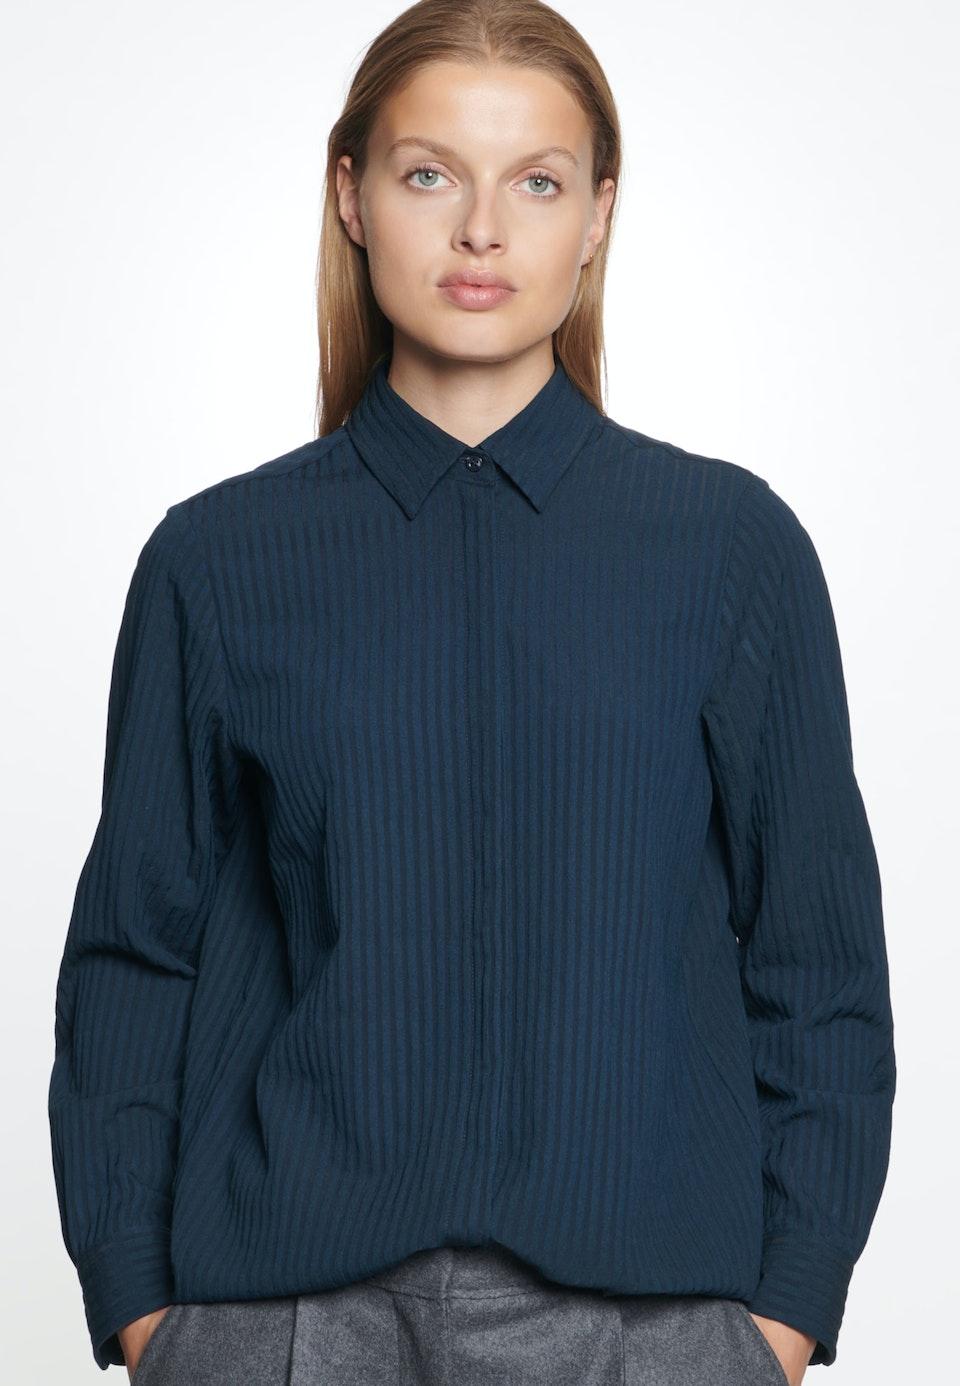 Voile Shirt Blouse made of viscose blend in Dark blue |  Seidensticker Onlineshop